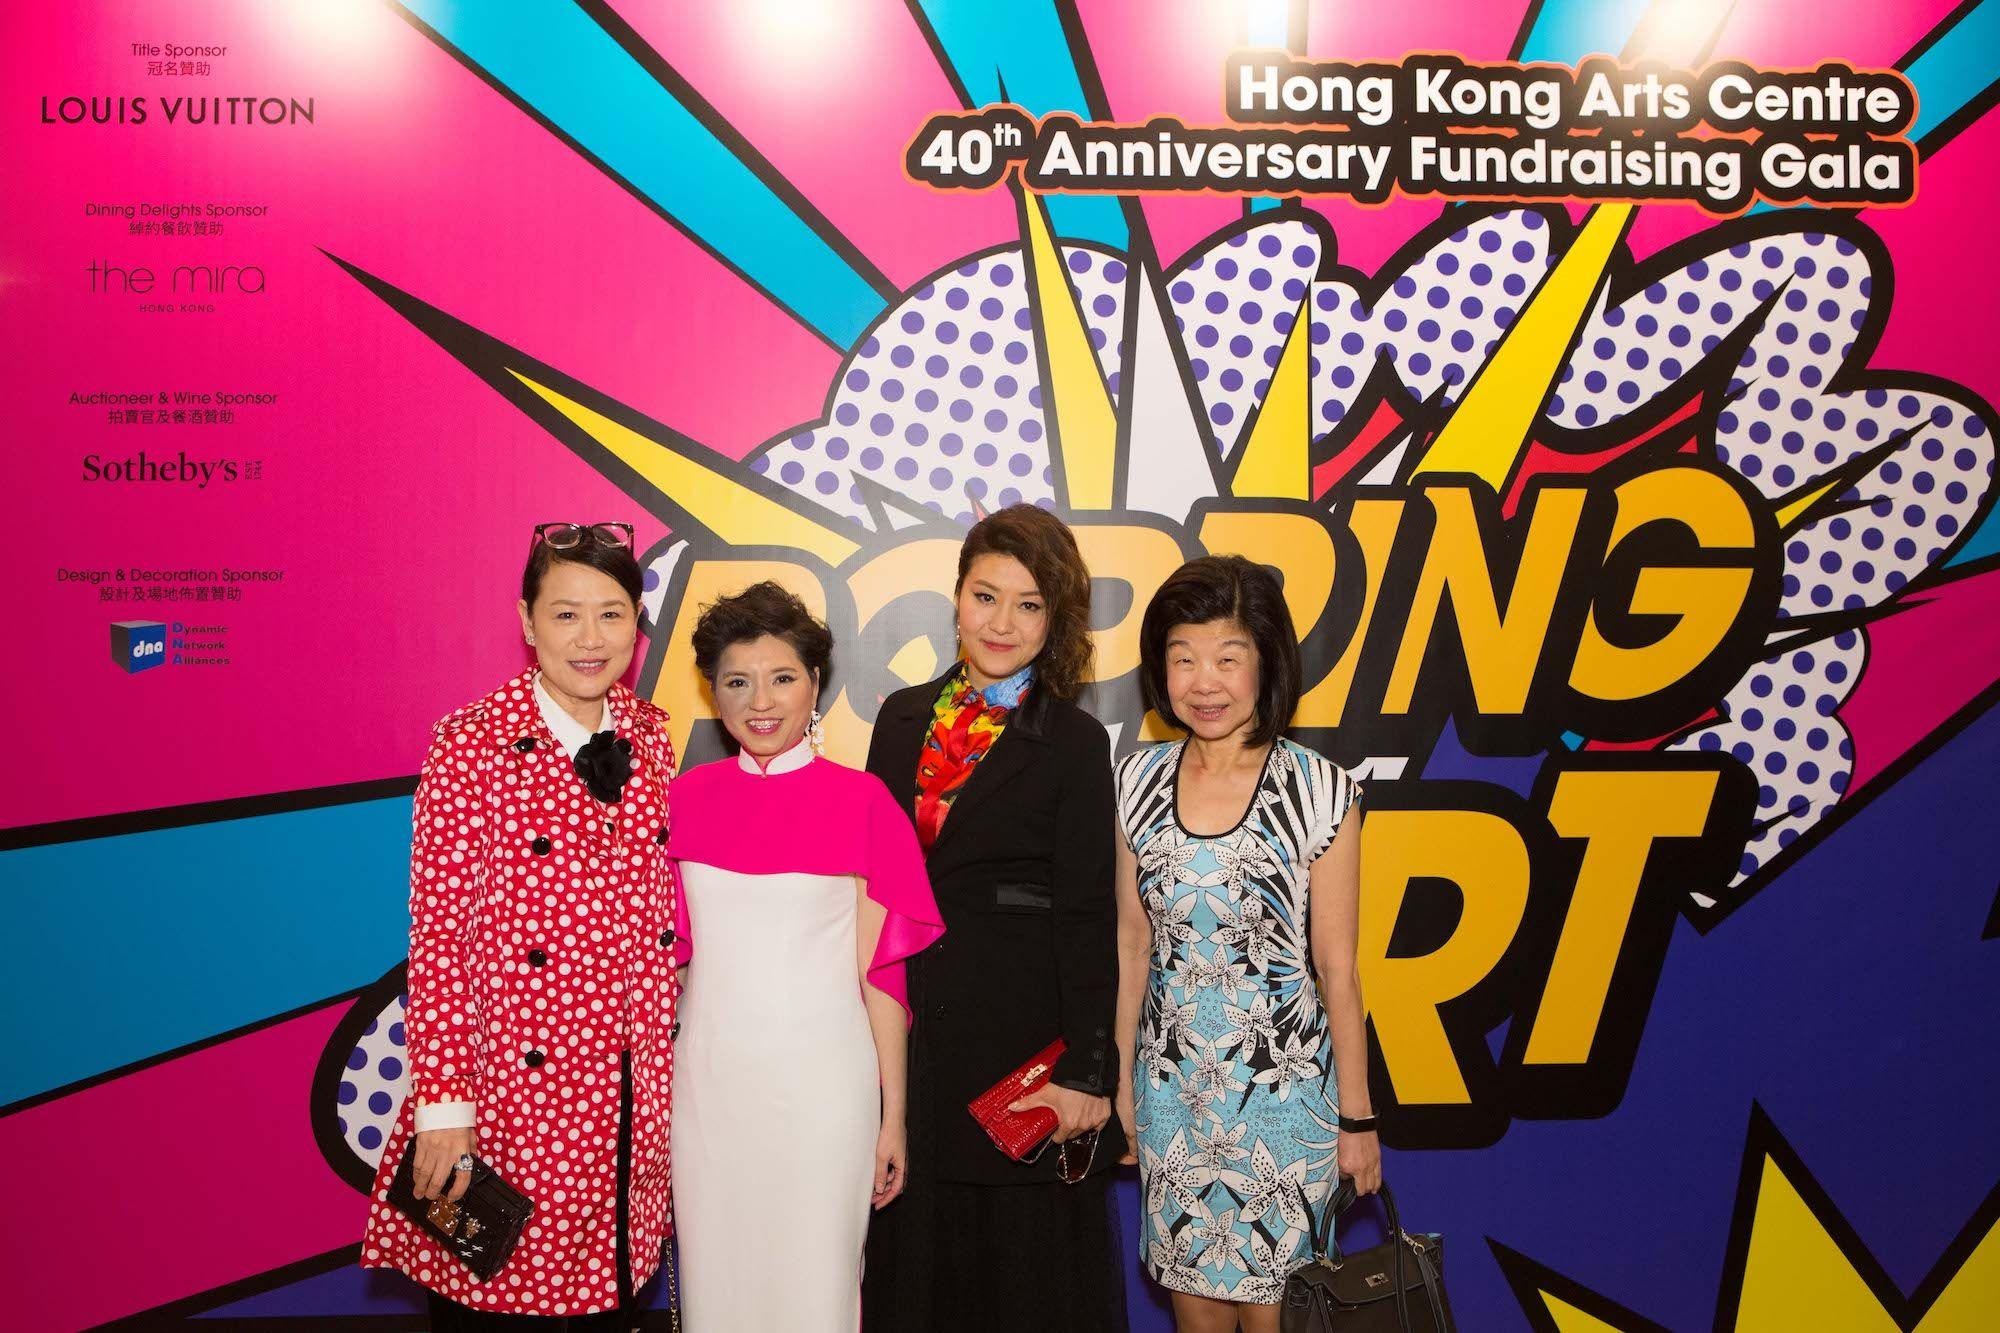 Linda Lau, Connie Lam, Cecilia Cheung, Lisa Tang